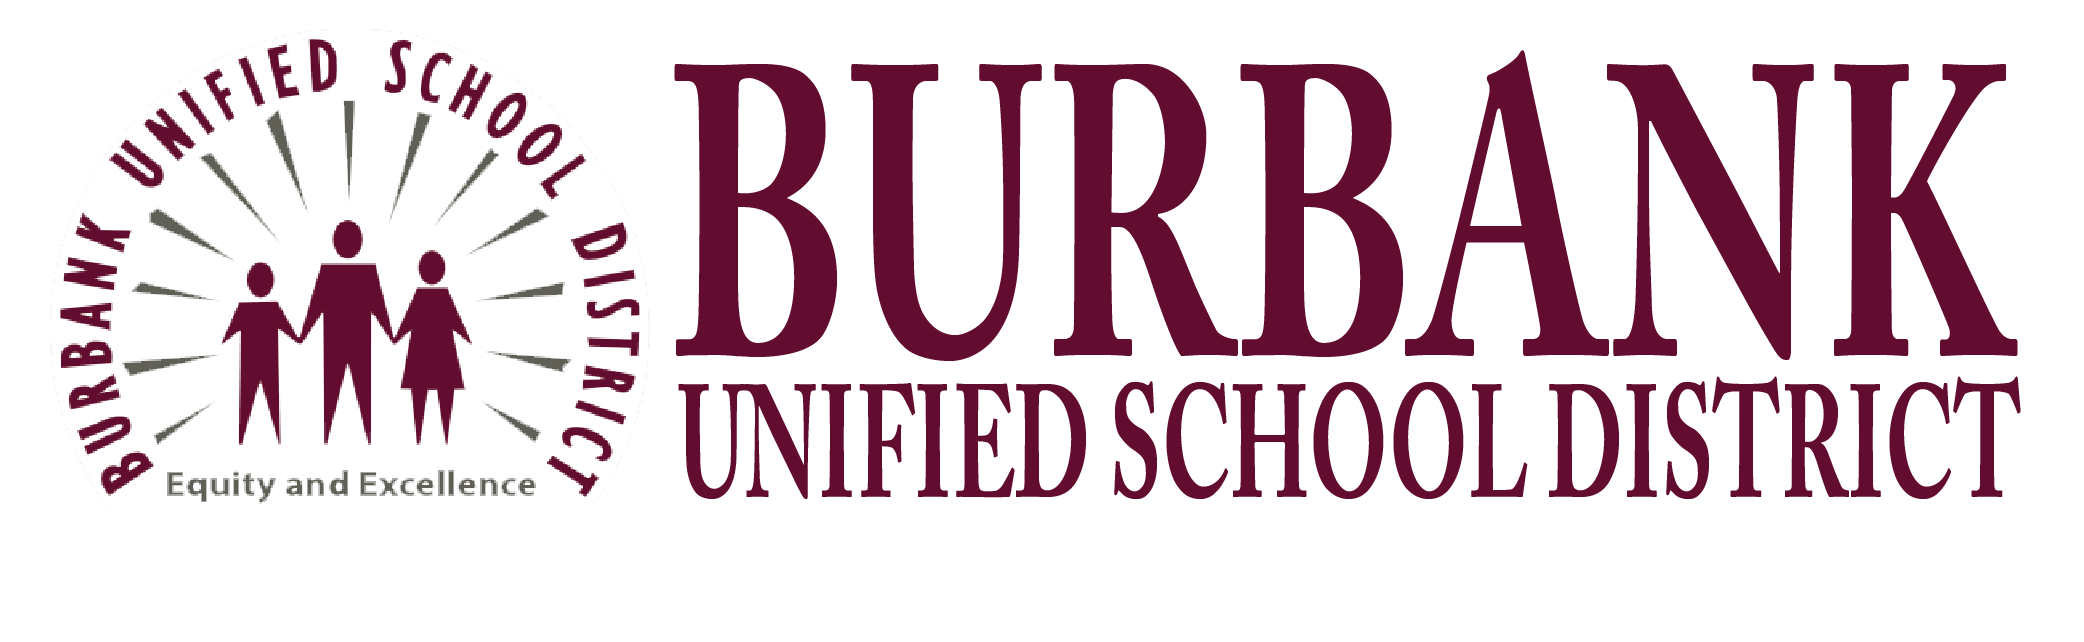 Burbank Unified School District / Homepage